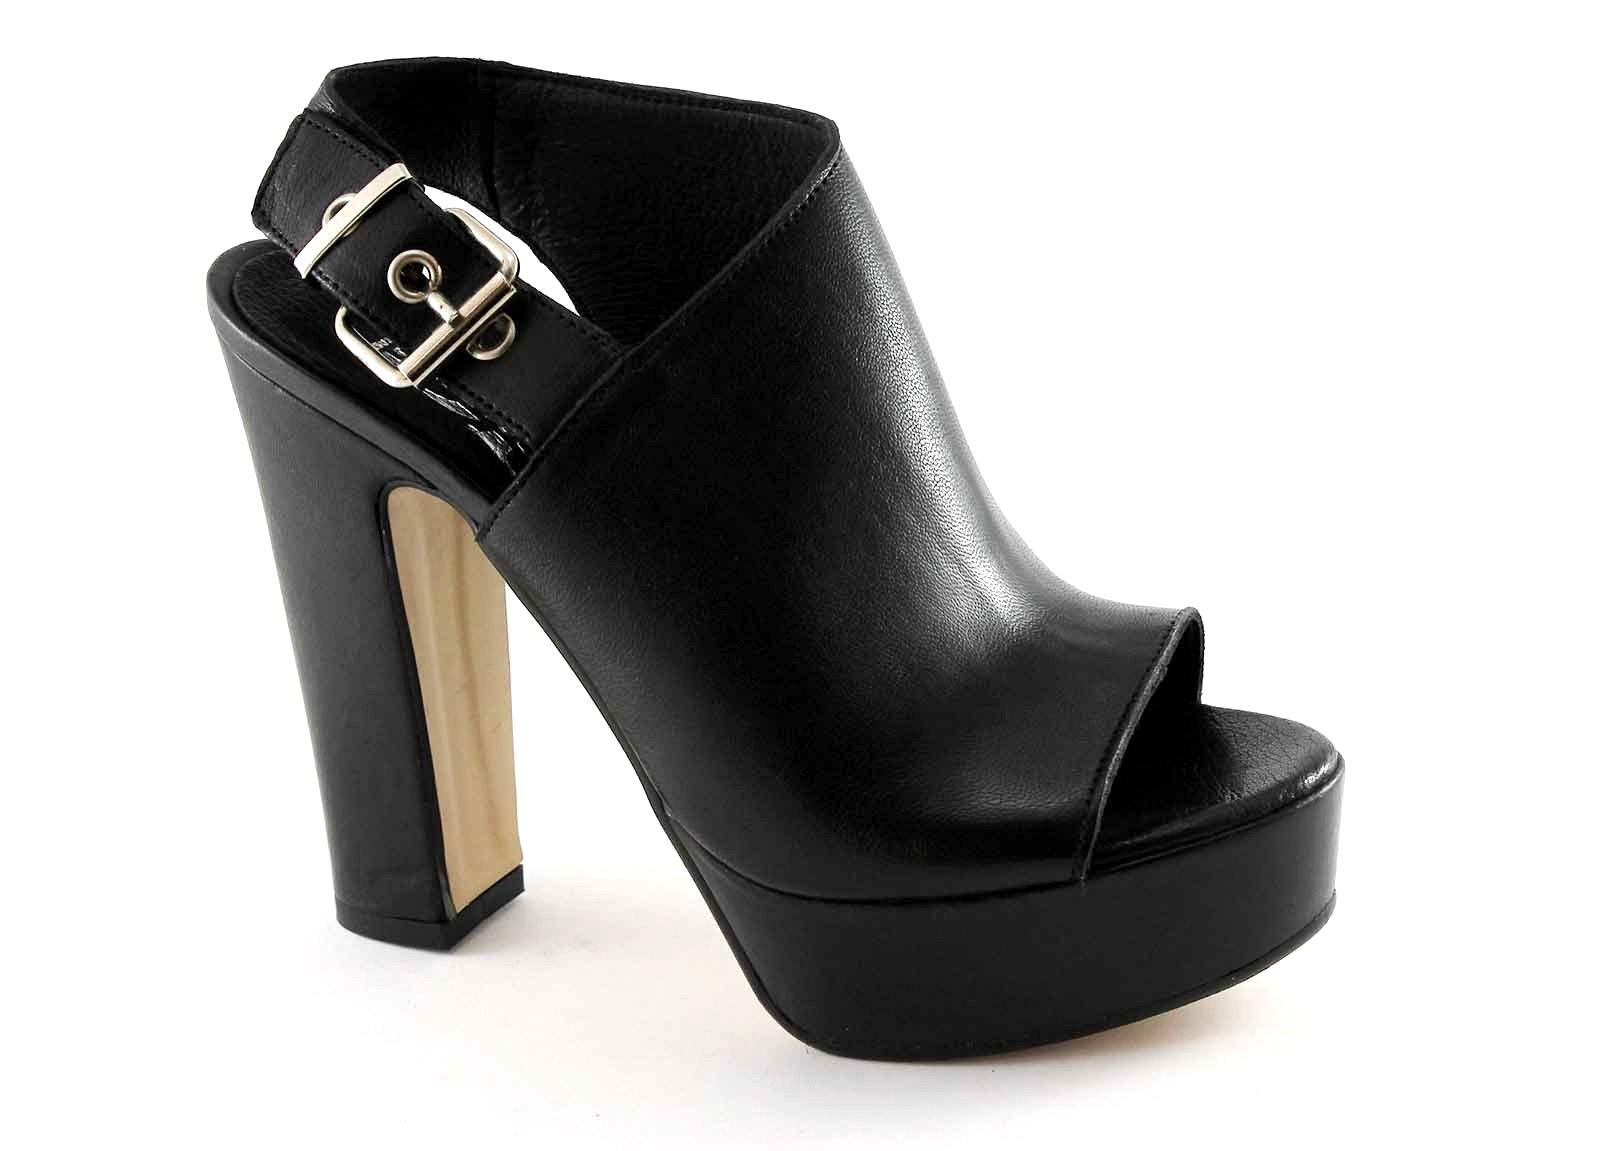 DIVINE FOLLIE 908 nero sandali donna tronchetti tacco plateaux fibbia